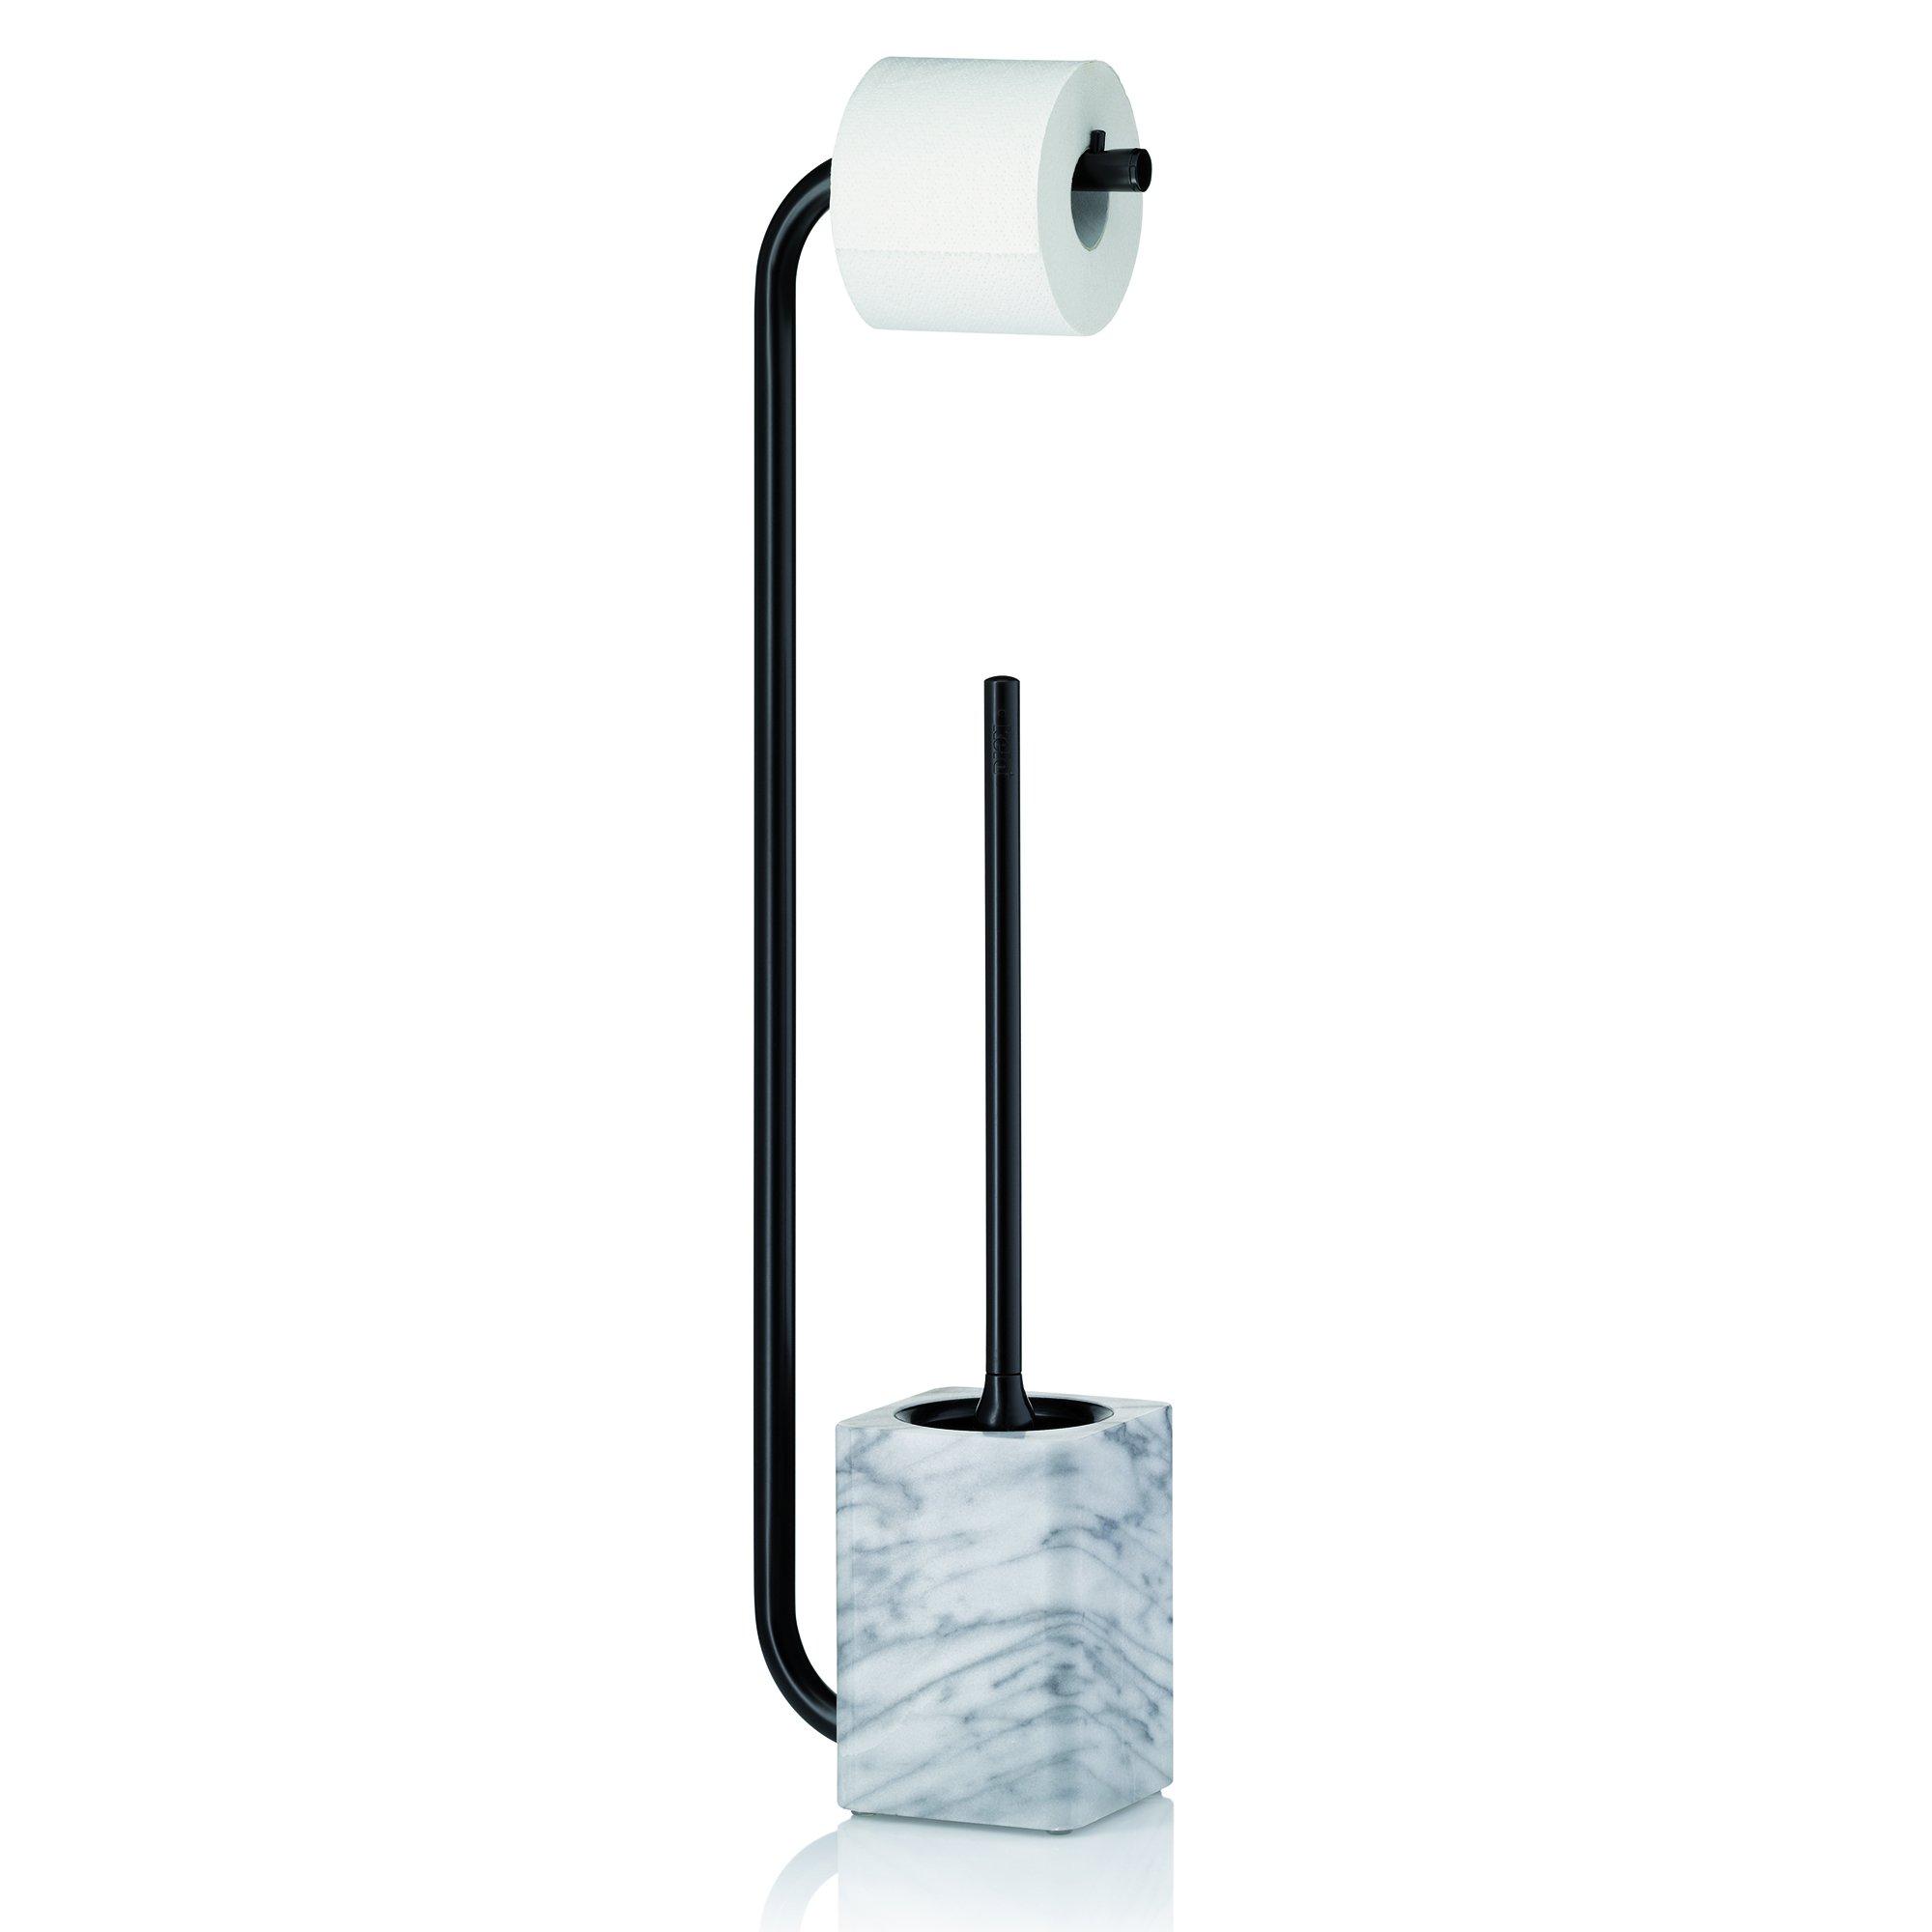 Kela 20031 Toilet Brush Set with Toilet Paper Holder, Varda Collection, Marble White